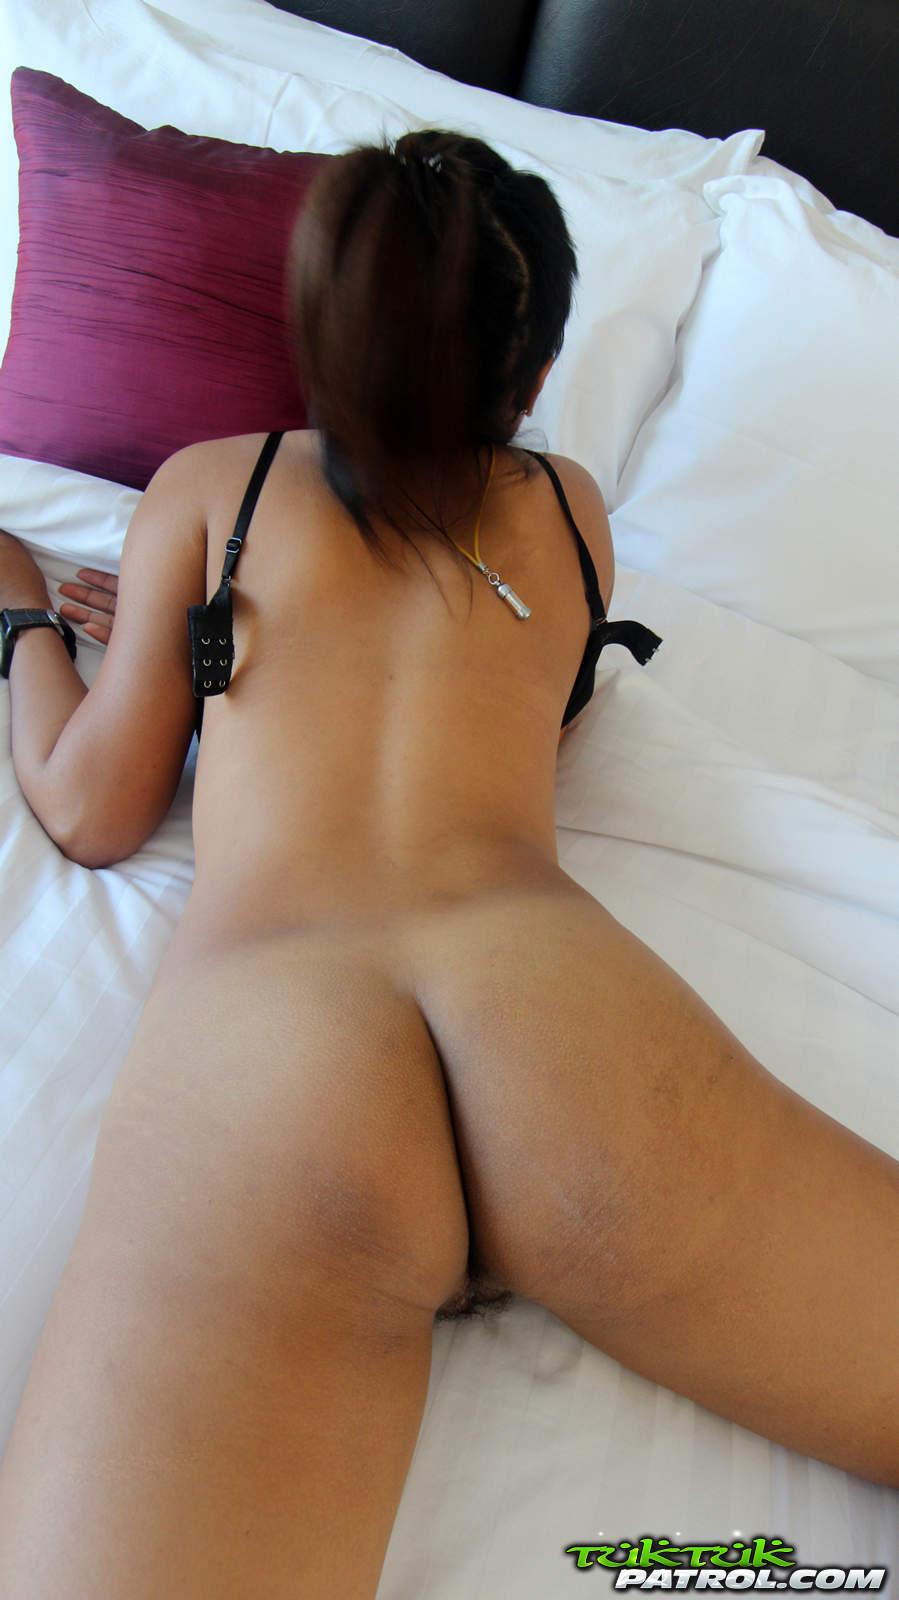 TukTuk Patrol | Thai babe with stunning body, big tits and ...